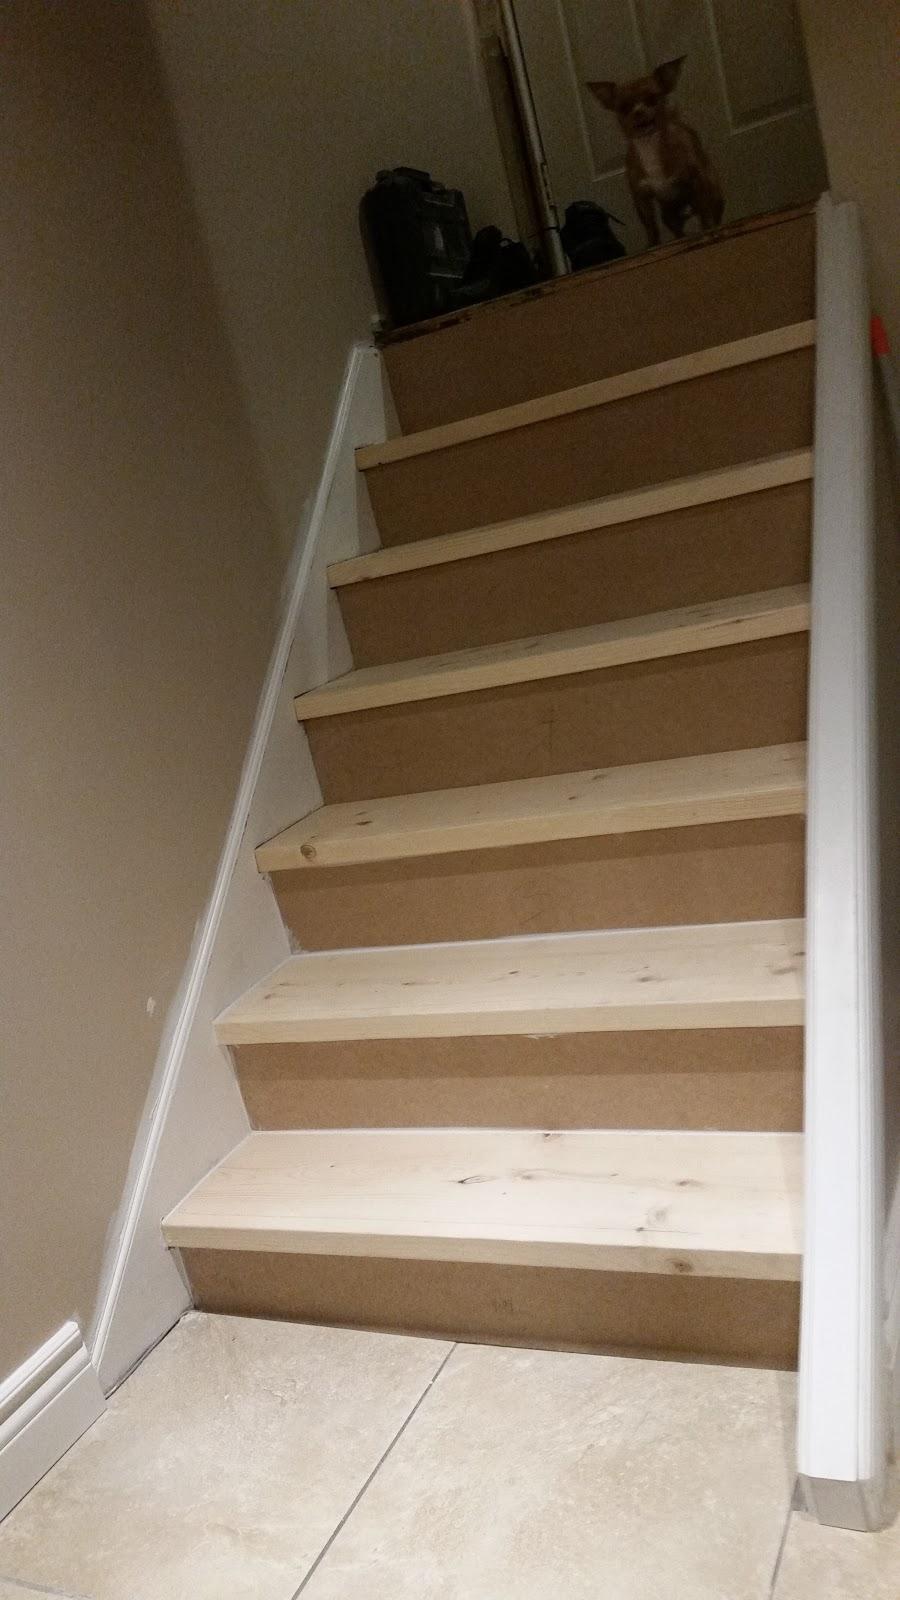 Cruzz Construction | home goods store | 3 Lasila Ct, Hamilton, ON L9C 7B6, Canada | 2893086563 OR +1 289-308-6563